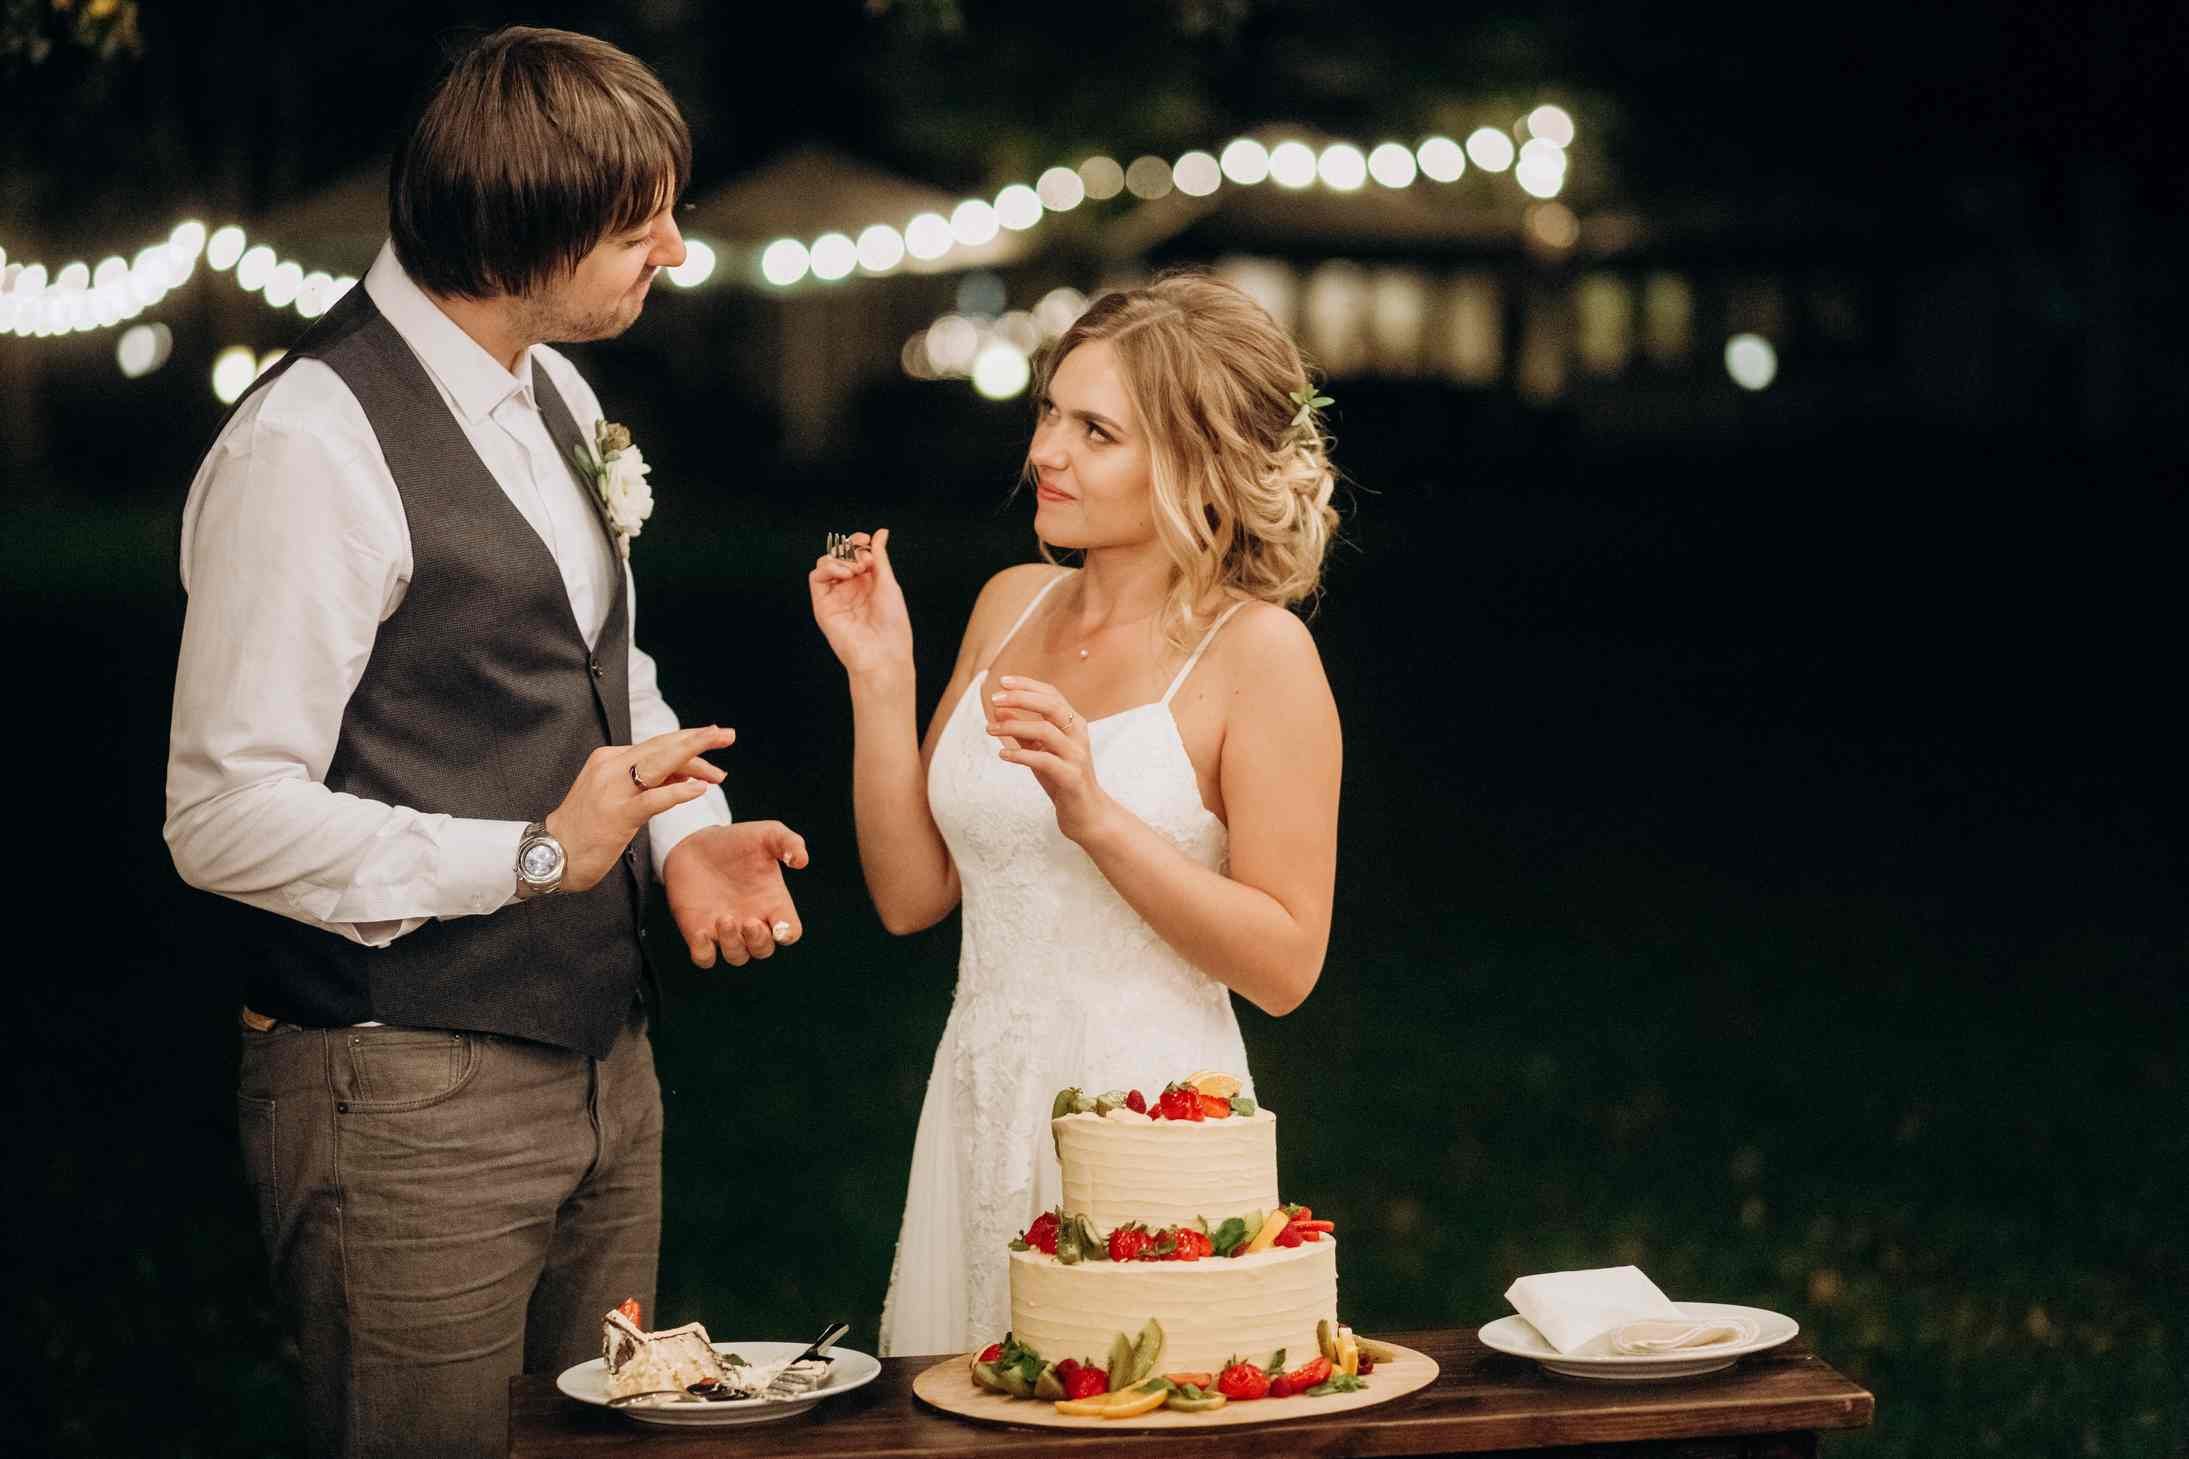 молодожены кормят друг друга тортом